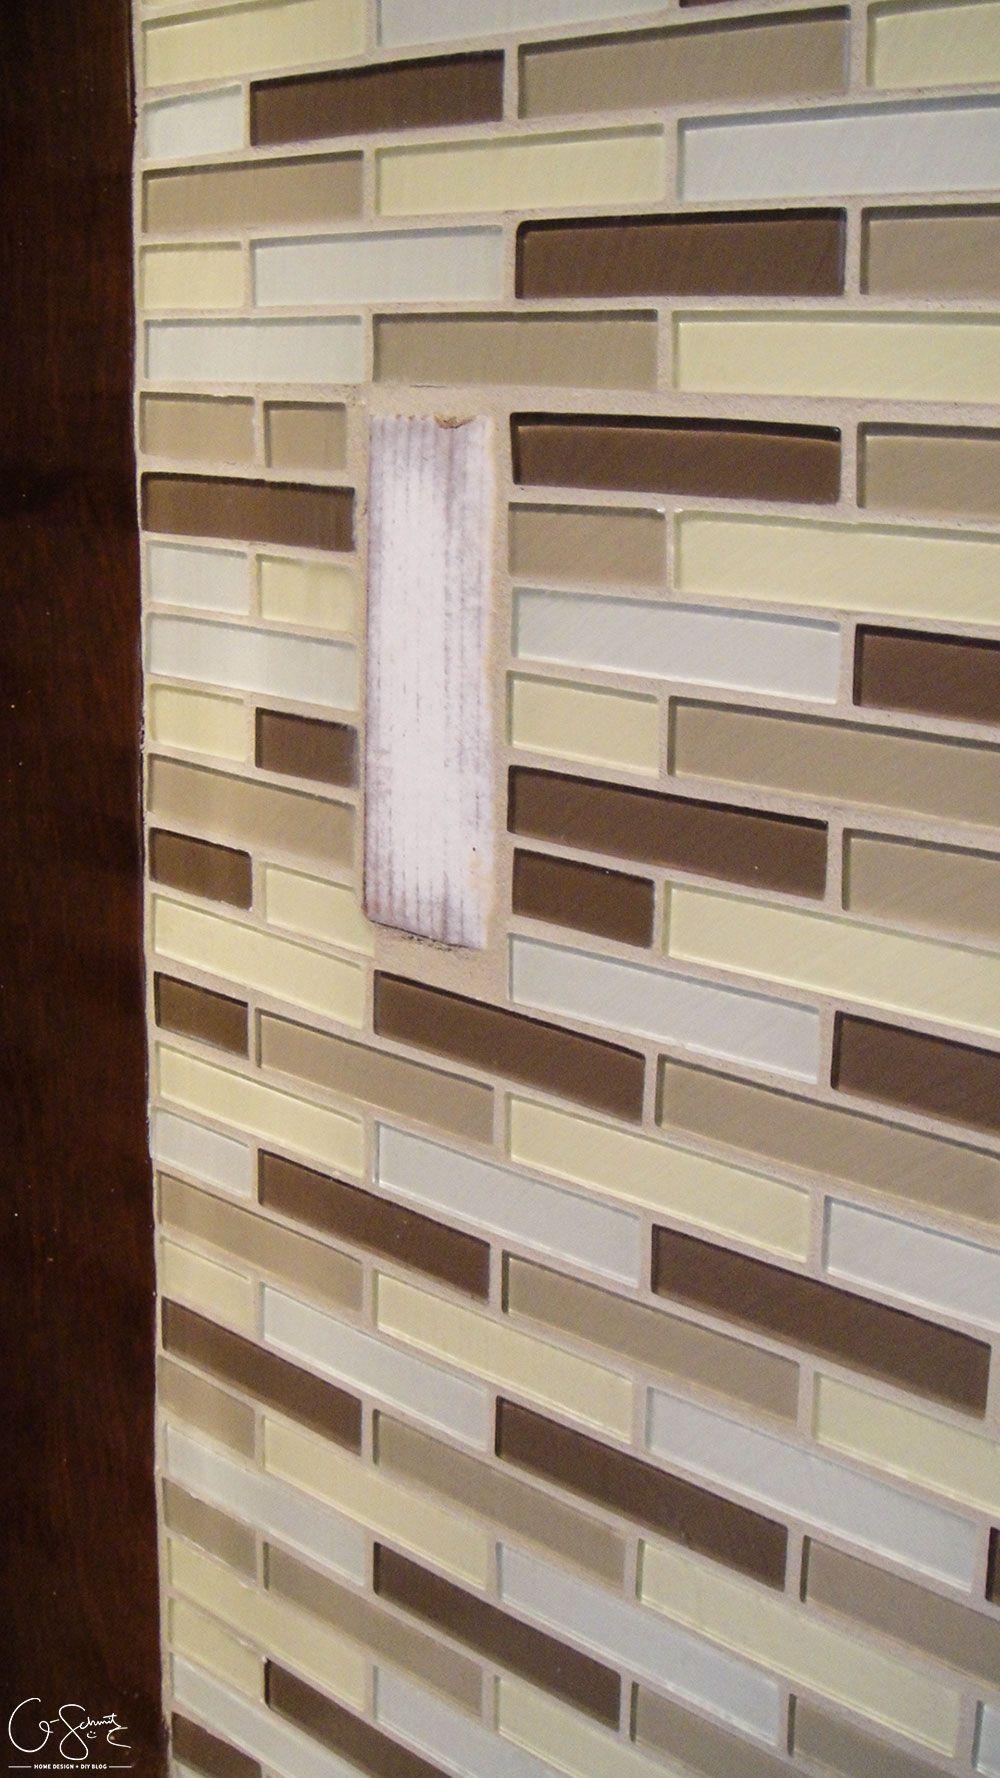 Tiling the Kitchen Backsplash | how to paint oak cabinets ...